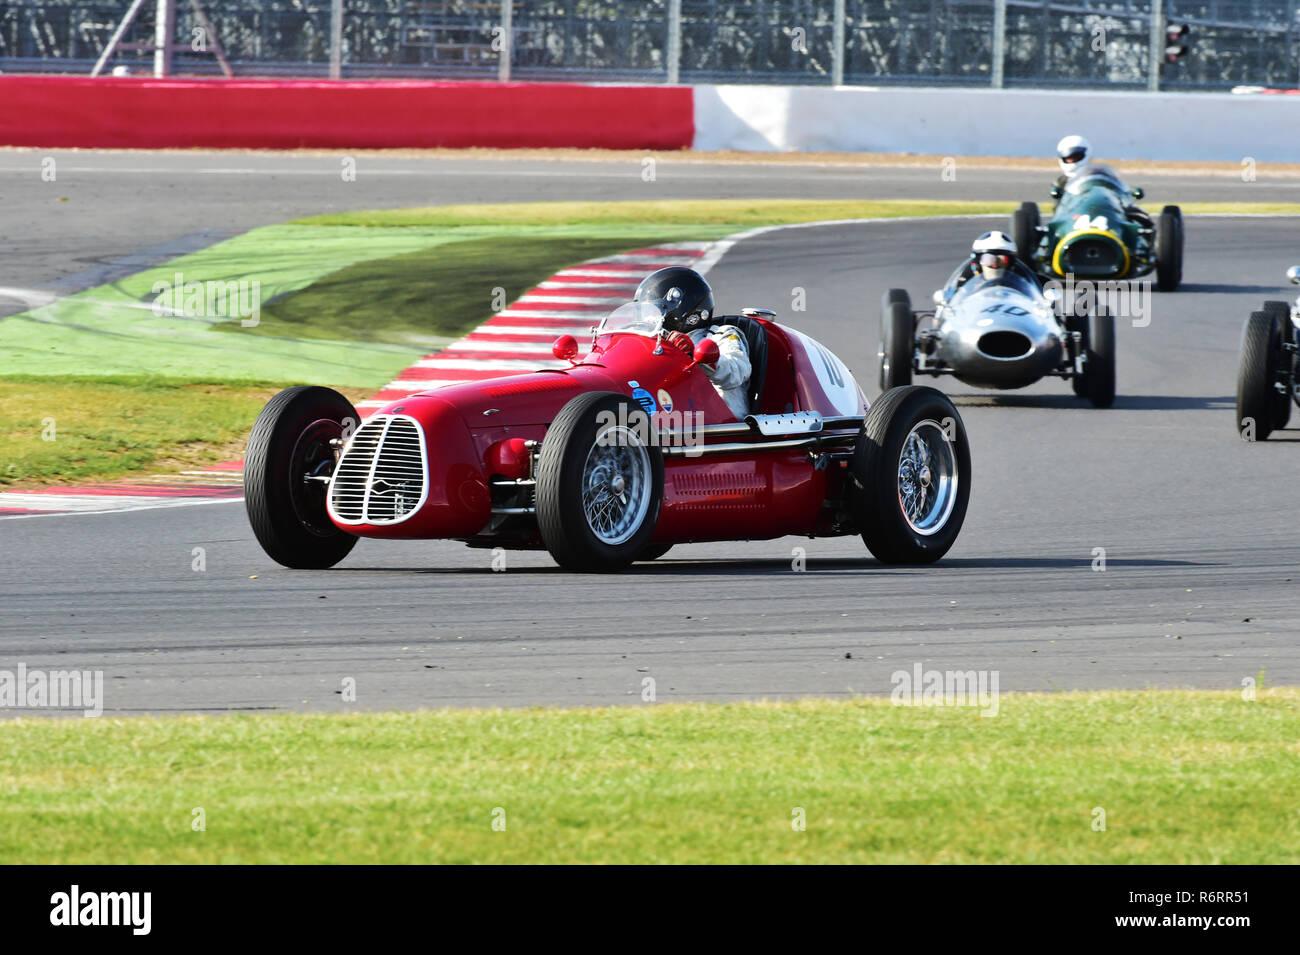 Julia de Baldanza, Maserati A6GCM, Pre 61, Grand Prix cars, HGPCA, Maserati Centenary Trophy, Silverstone Classic 2014, 2014, Classic Racing Cars, Gra - Stock Image